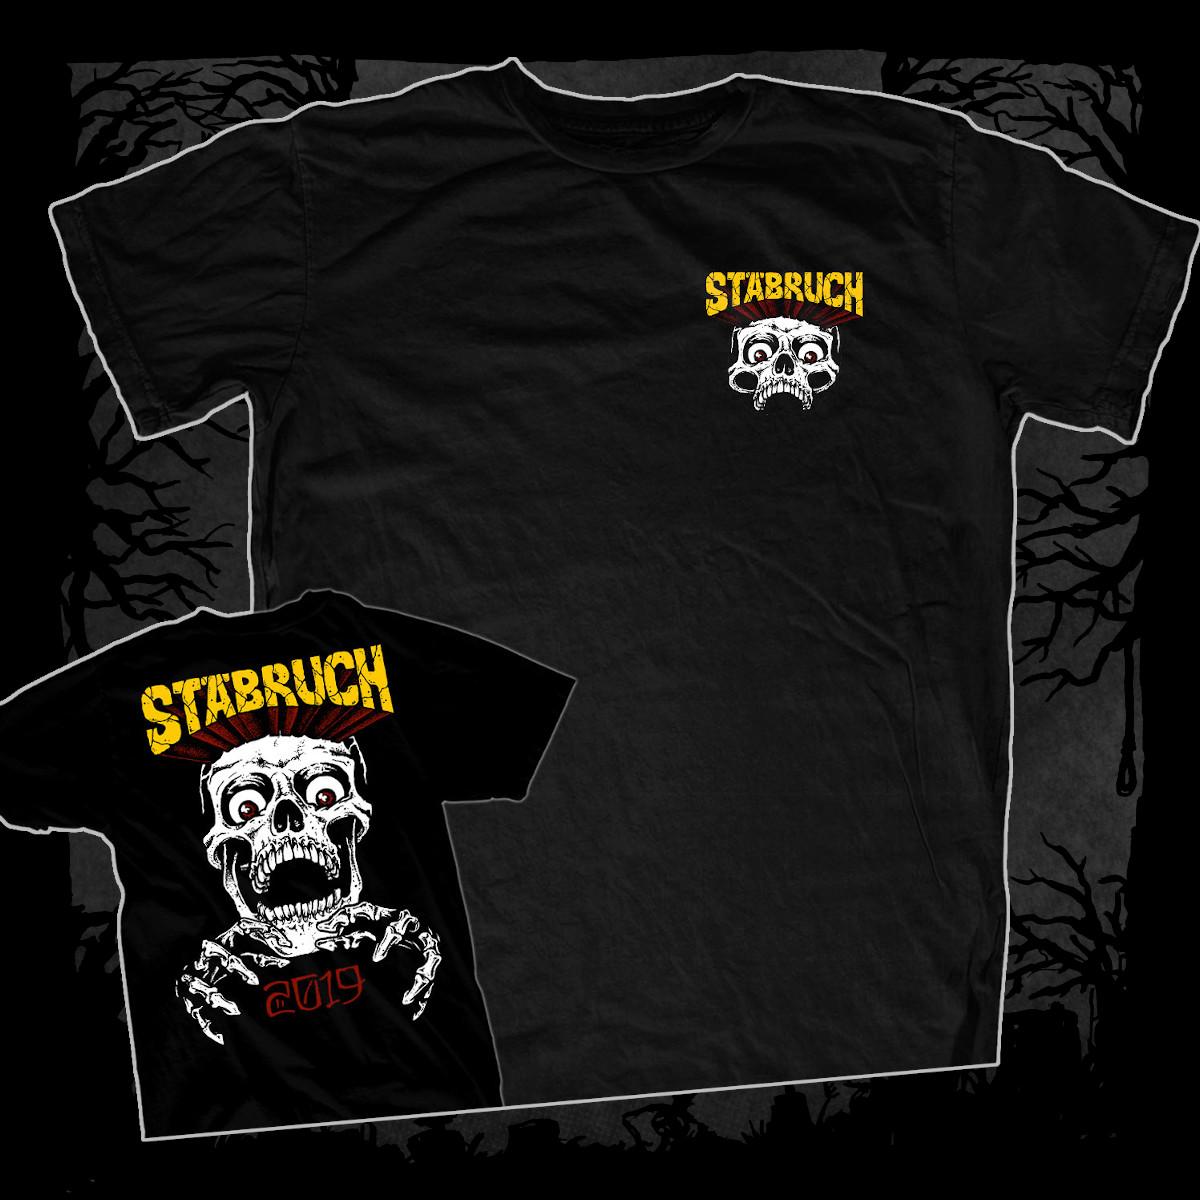 Stäbruch - 2019 [T-Shirt] (Farbe schwarz, Two-Sided-Print: weiß, gelb, rot)